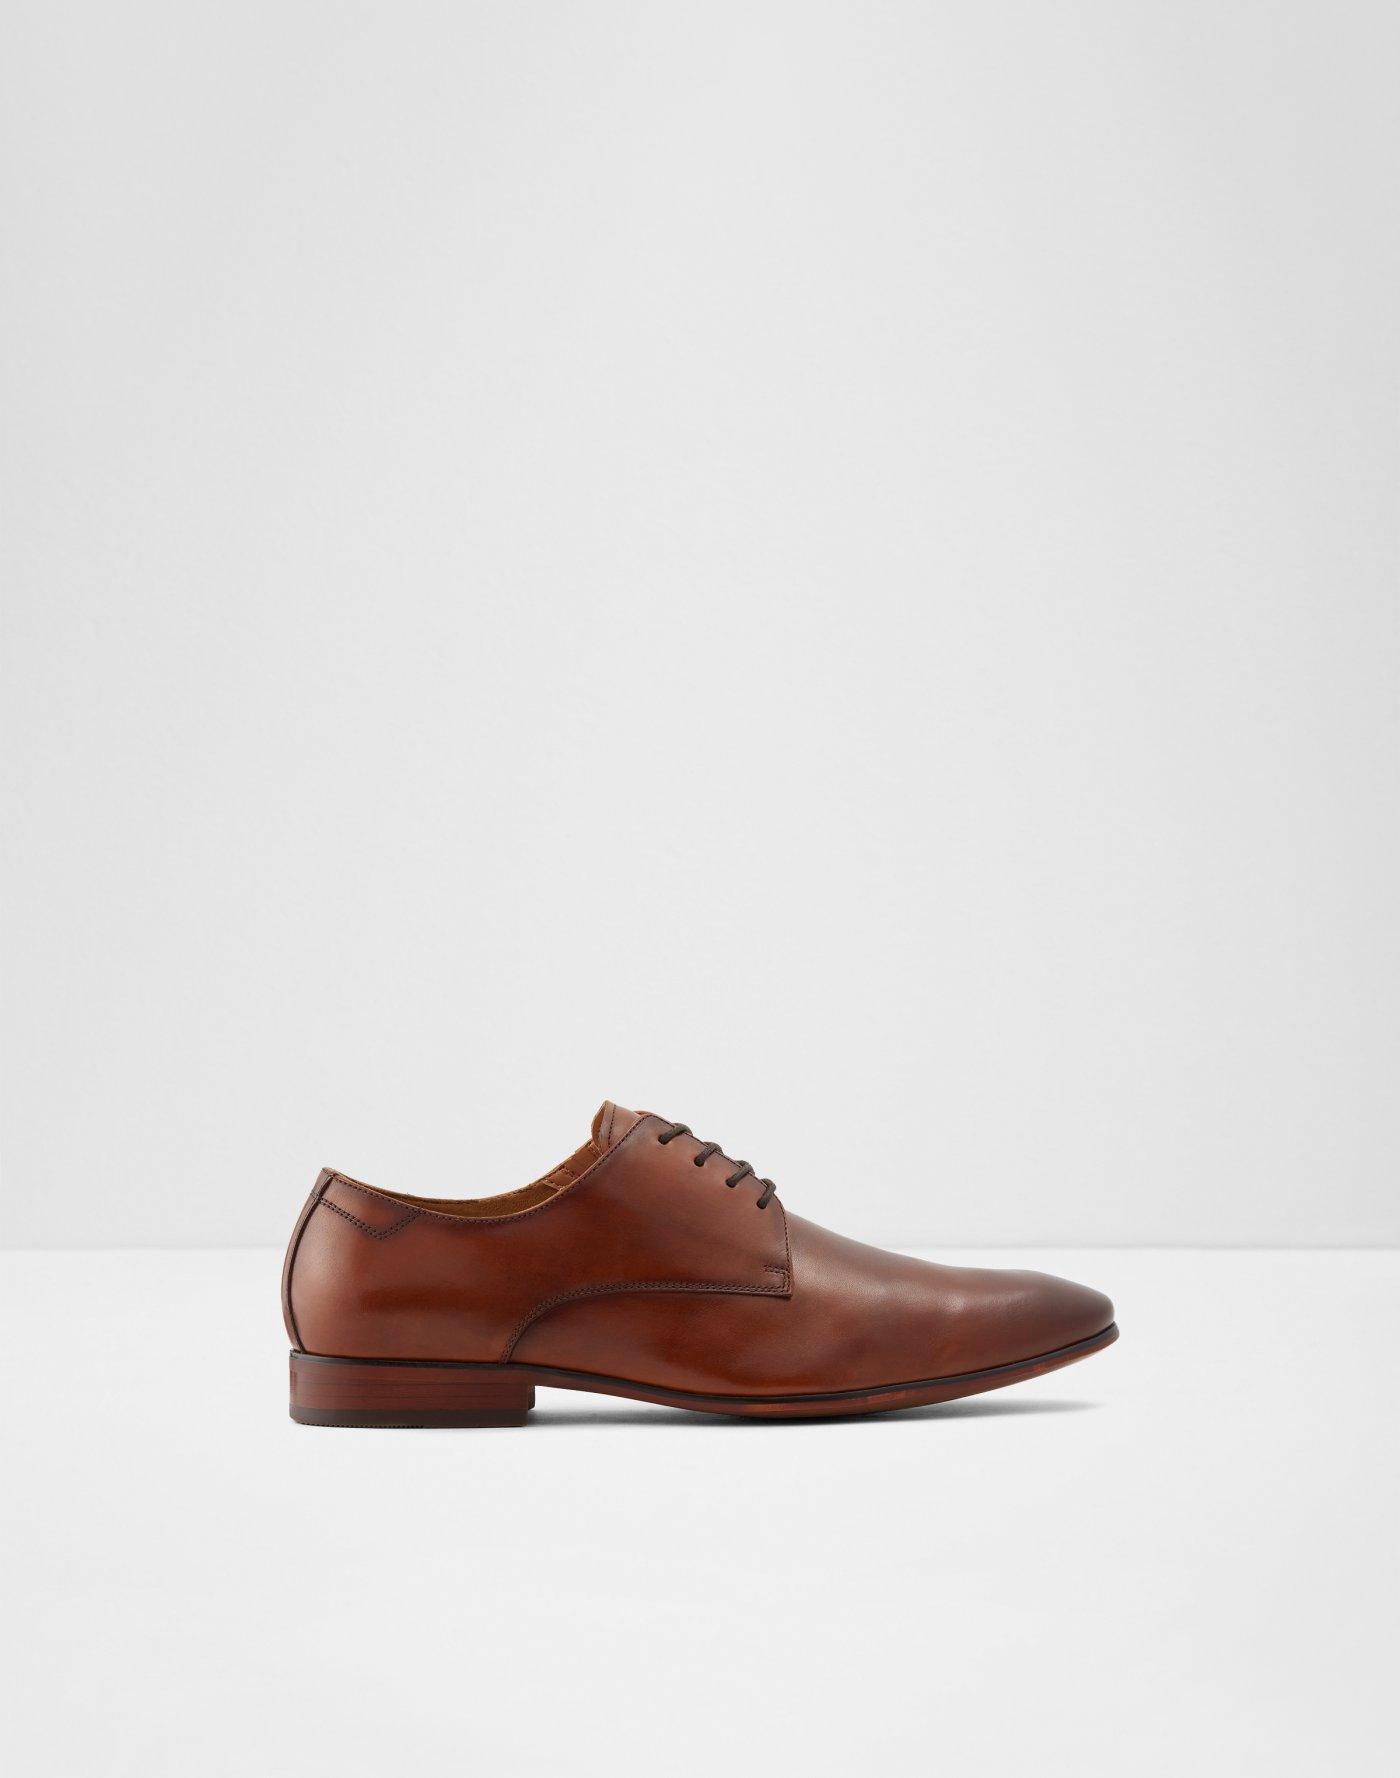 16133f2b2 Men's Dress Shoes | Formal & Oxford Shoes For Men | ALDO US ...